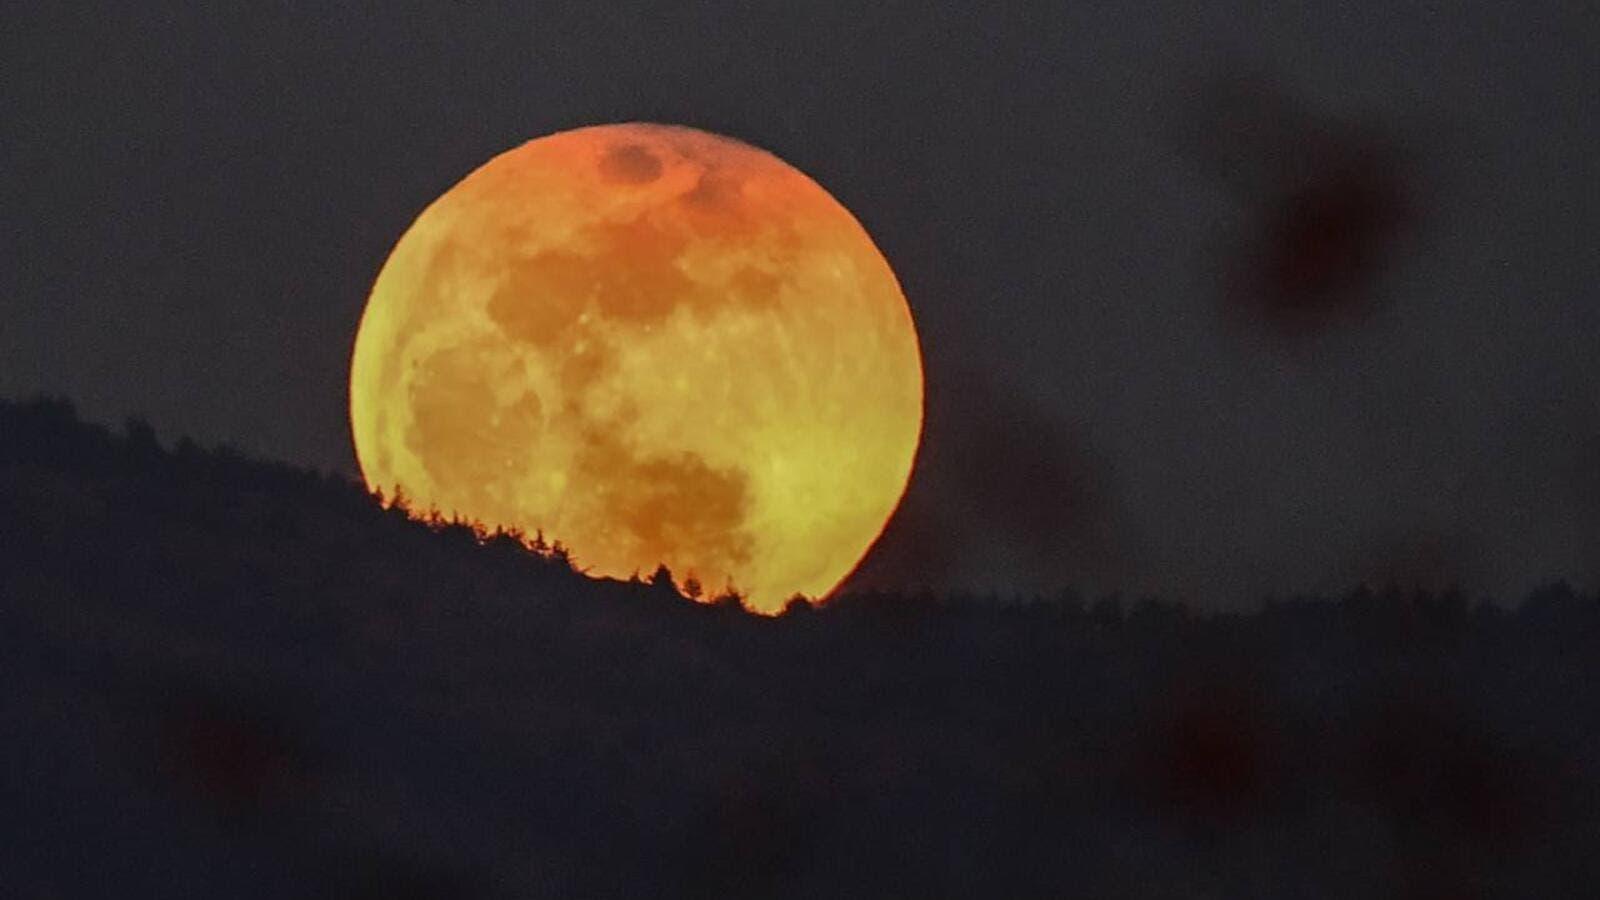 0121f6978188a شيخ درزي يتنبأ بكارثة عالمية ليلة خسوف القمر (فيديو)